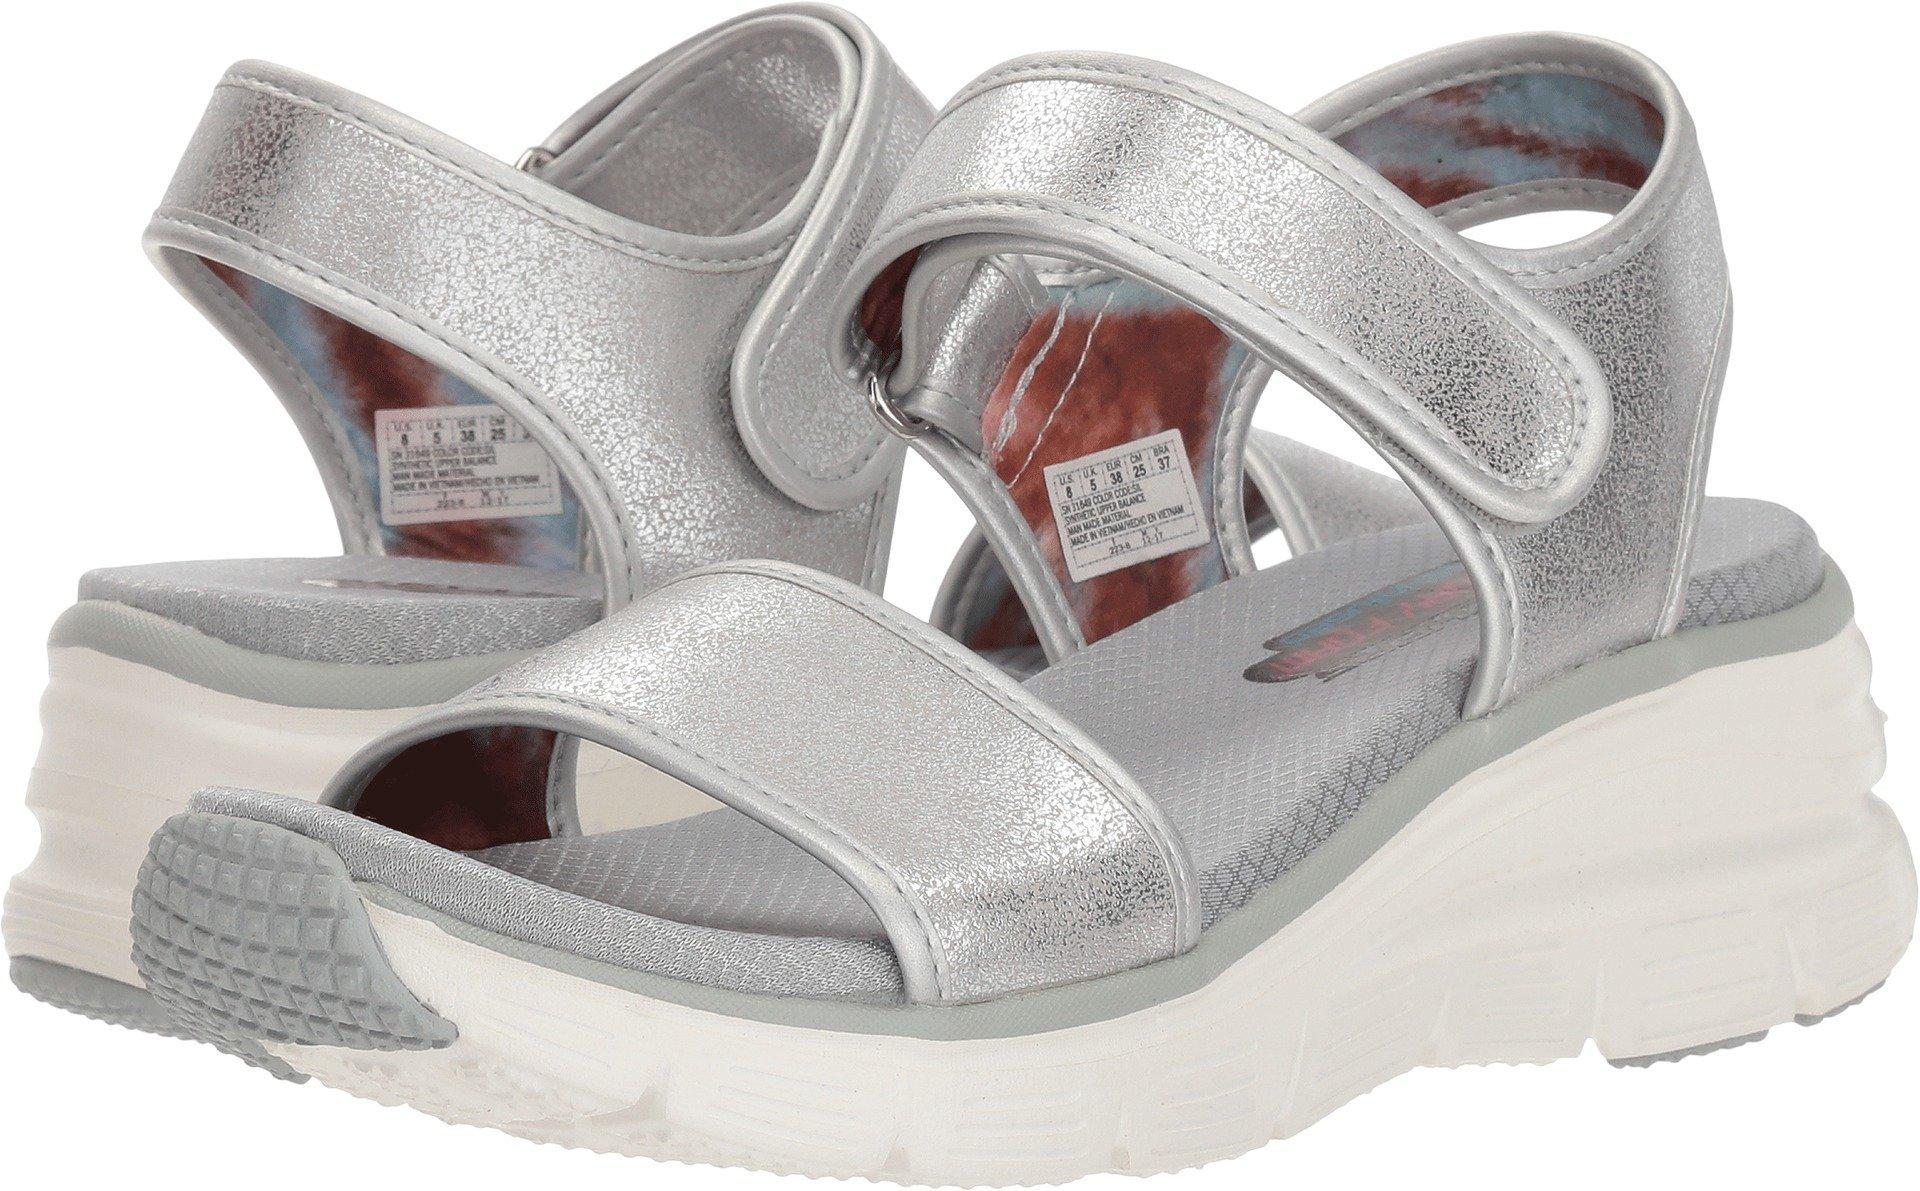 Skechers Women's Wedge Appeal - Brush-Off Silver 10 B US